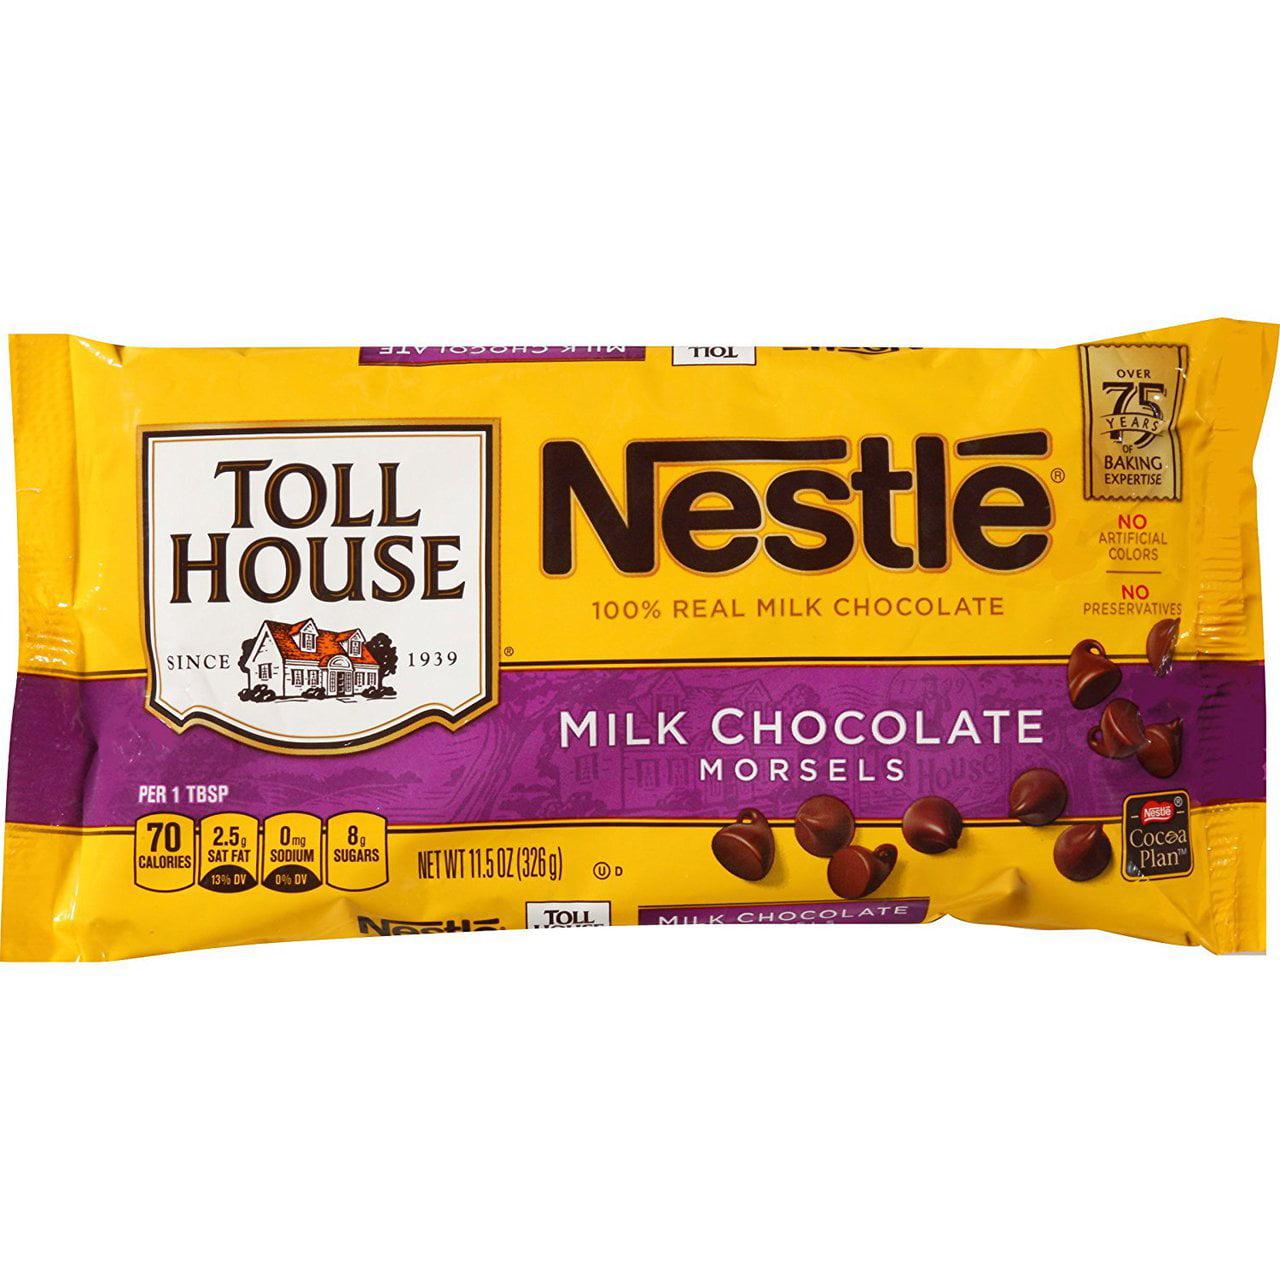 12 PACKS : Nestle TOLL HOUSE Milk Chocolate Morsels 11.5 oz. Bag